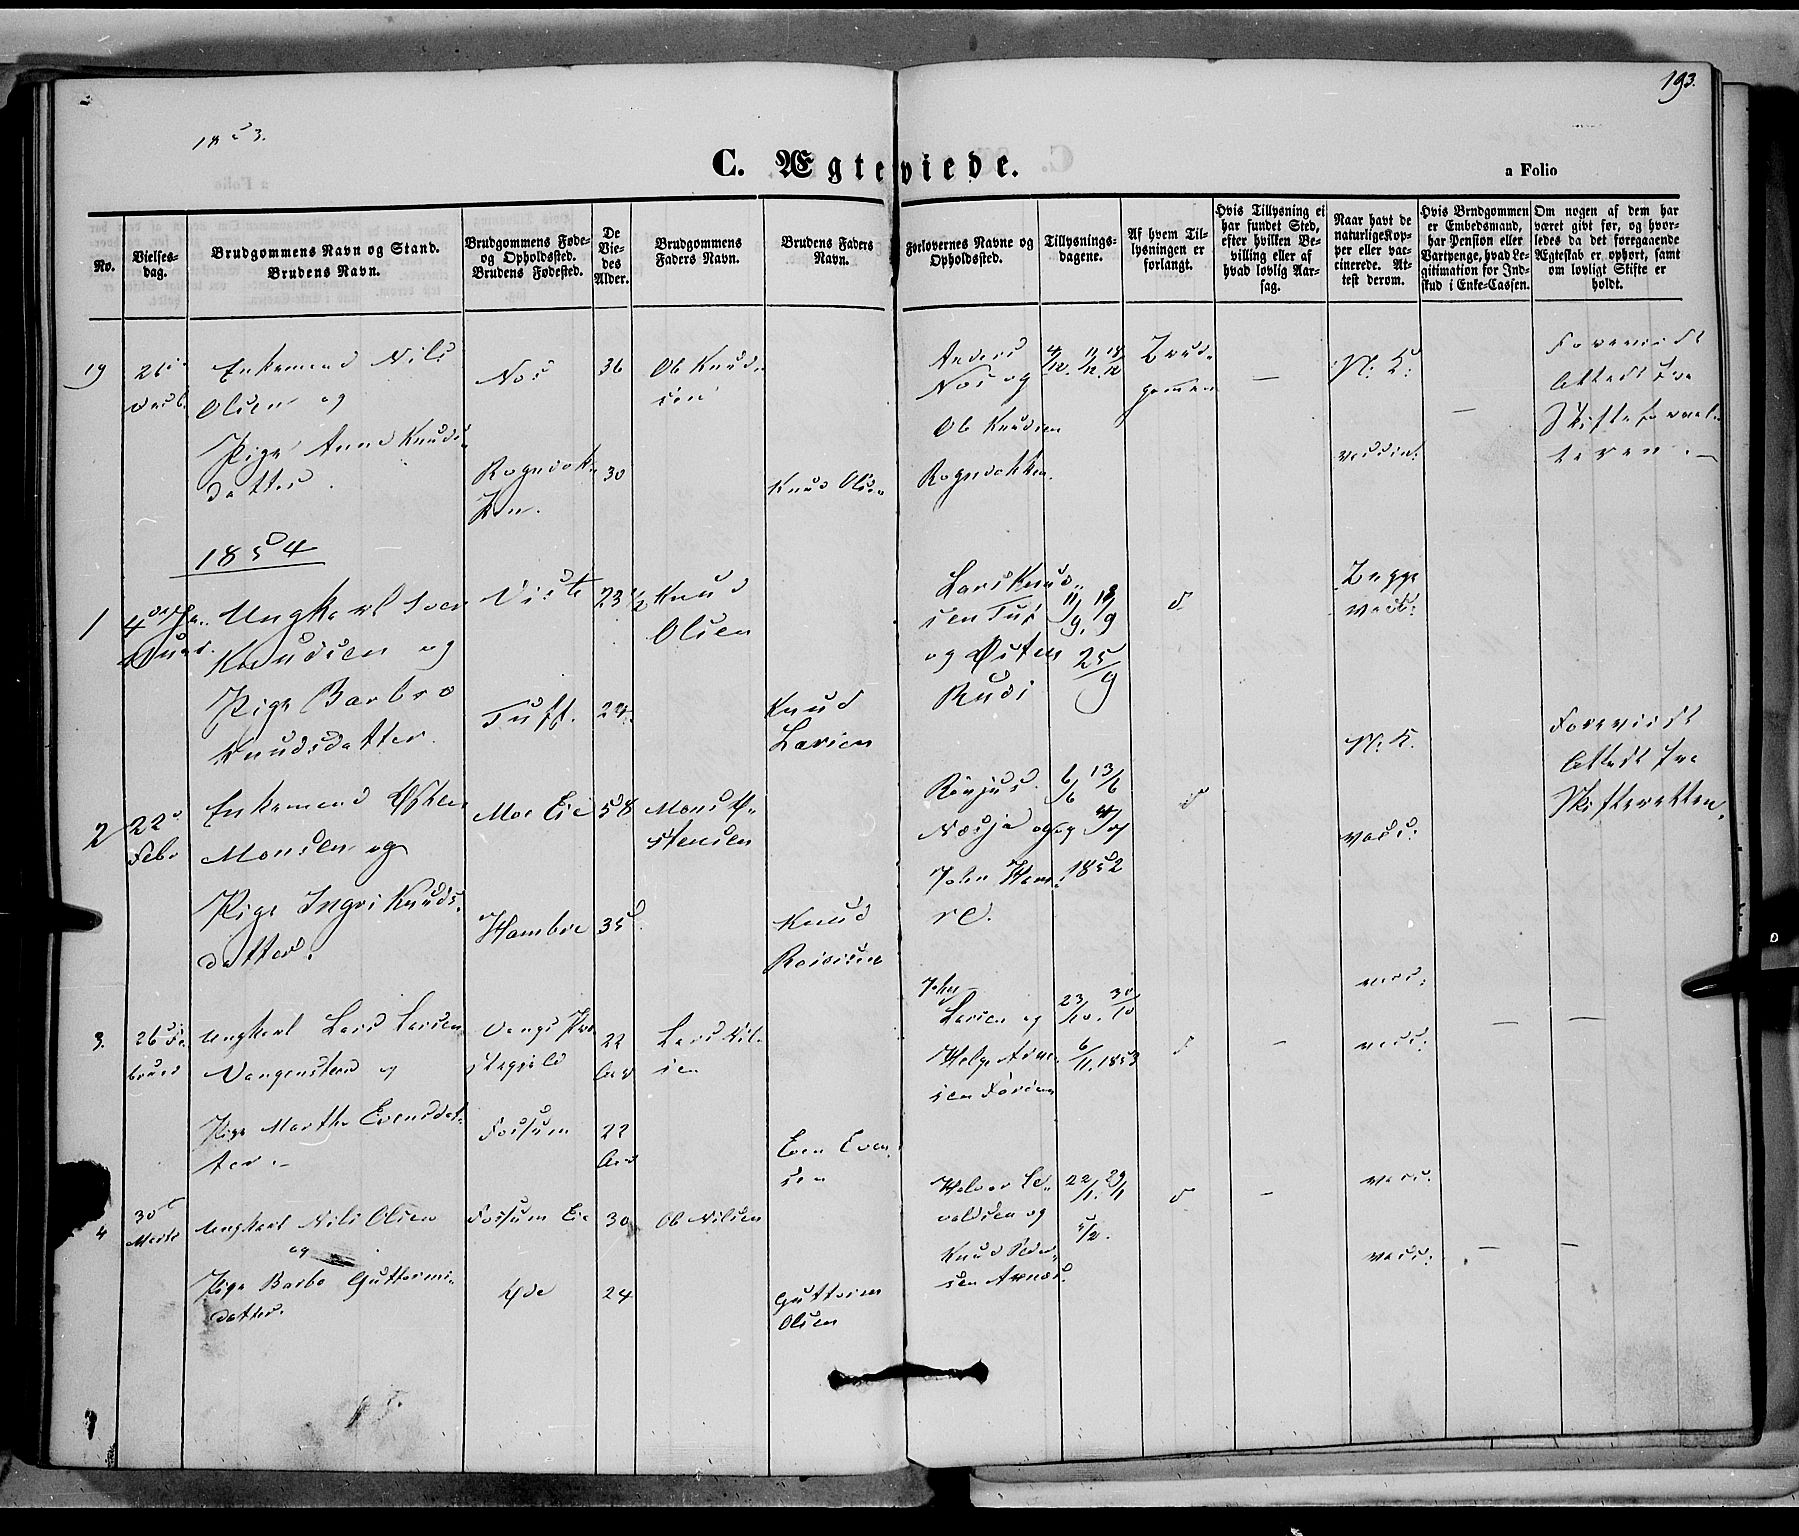 SAH, Vestre Slidre prestekontor, Ministerialbok nr. 1, 1844-1855, s. 193